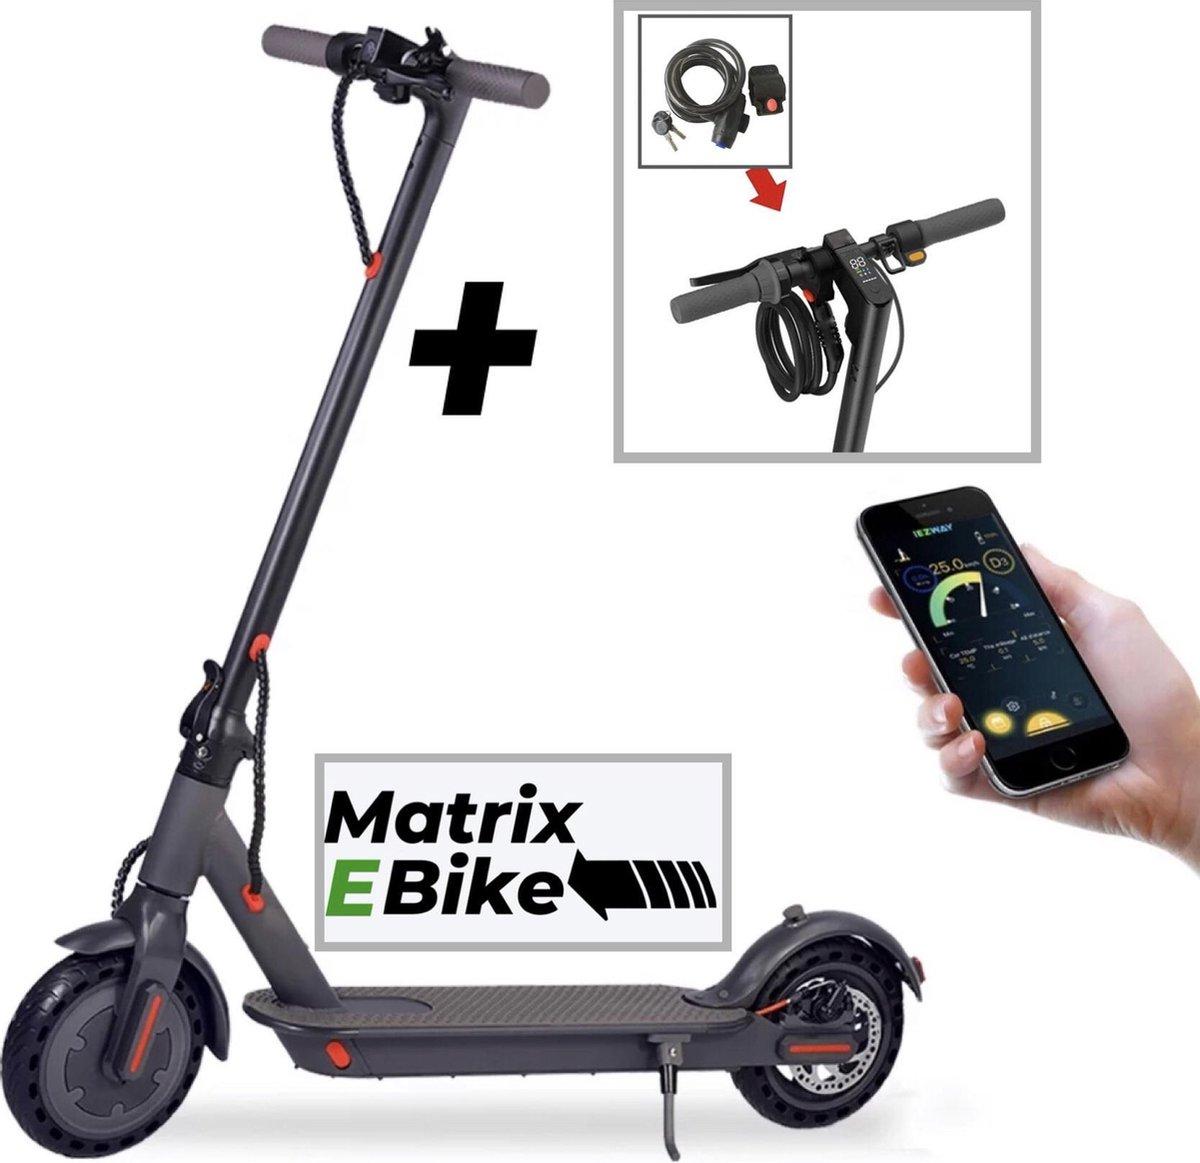 D8 Pro S - Matrix E Bike - Elektrische Step - E Step Opvouwbaar - 500W Motor - 8.5 Inch Anti Lekbanden - IOS Android - 7.8Ah Batterij - Incl. Kabelslot